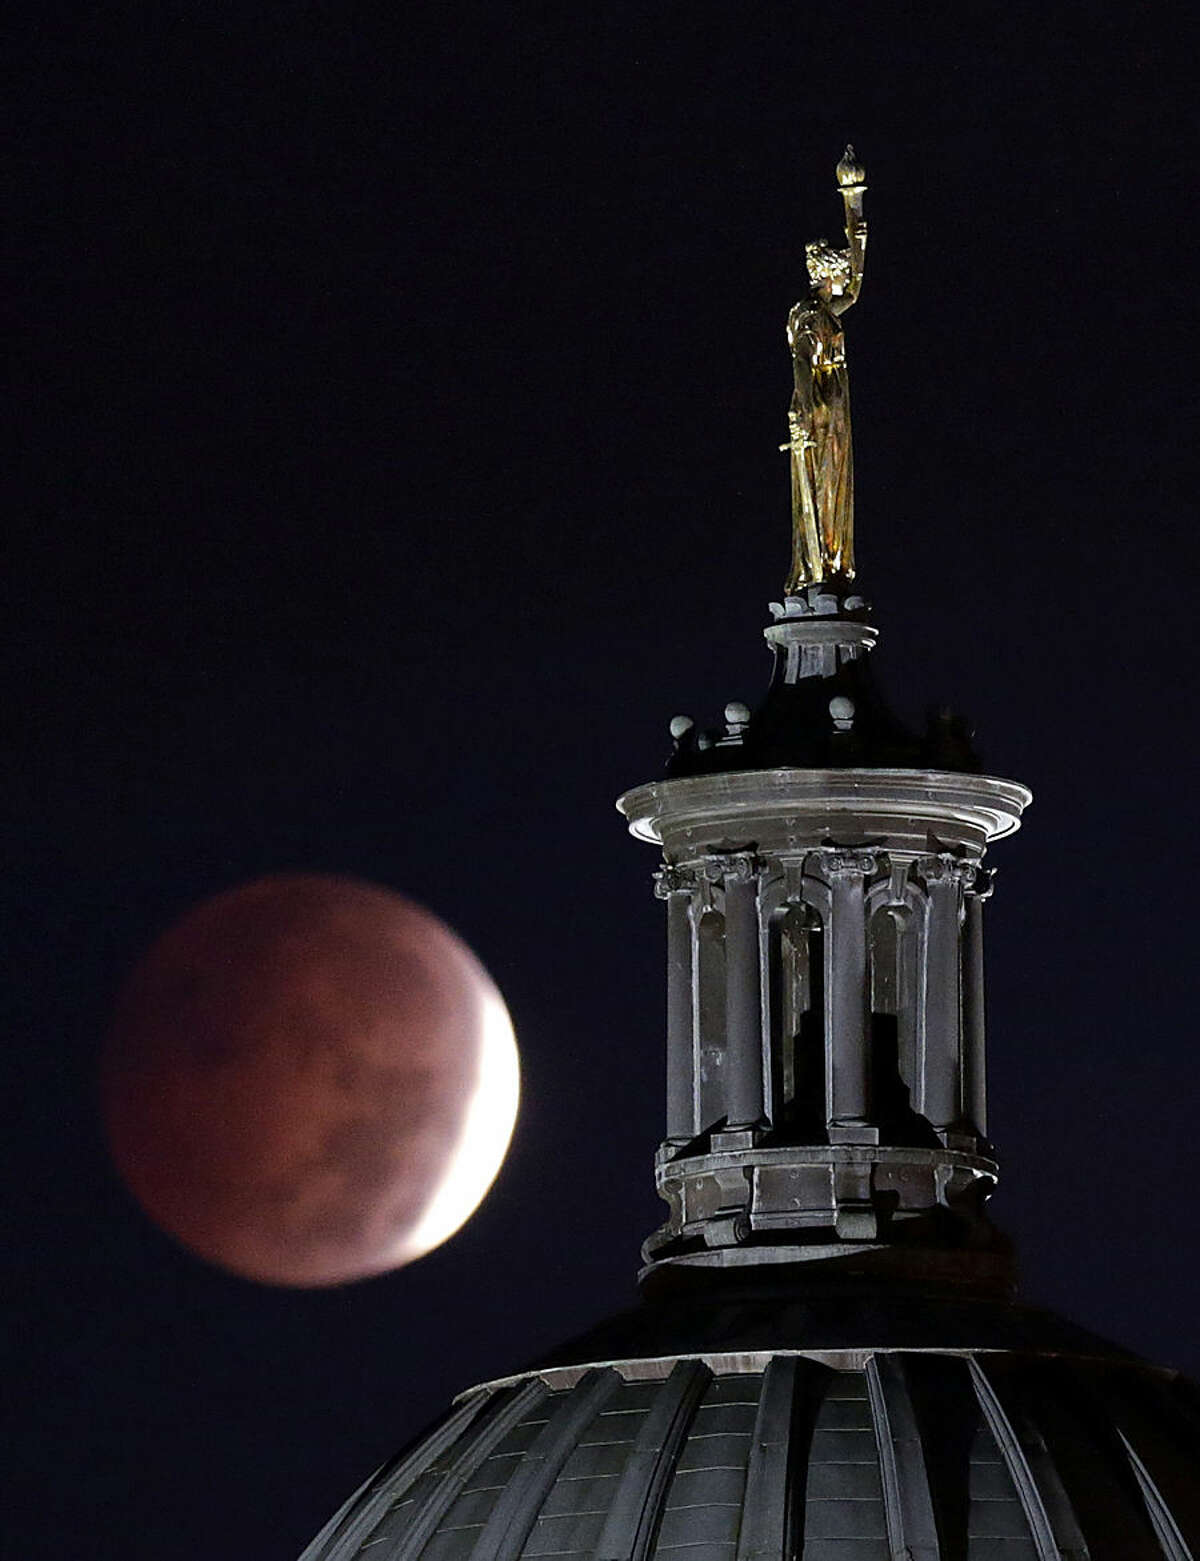 A lunar eclipse is seen near a statue entitled